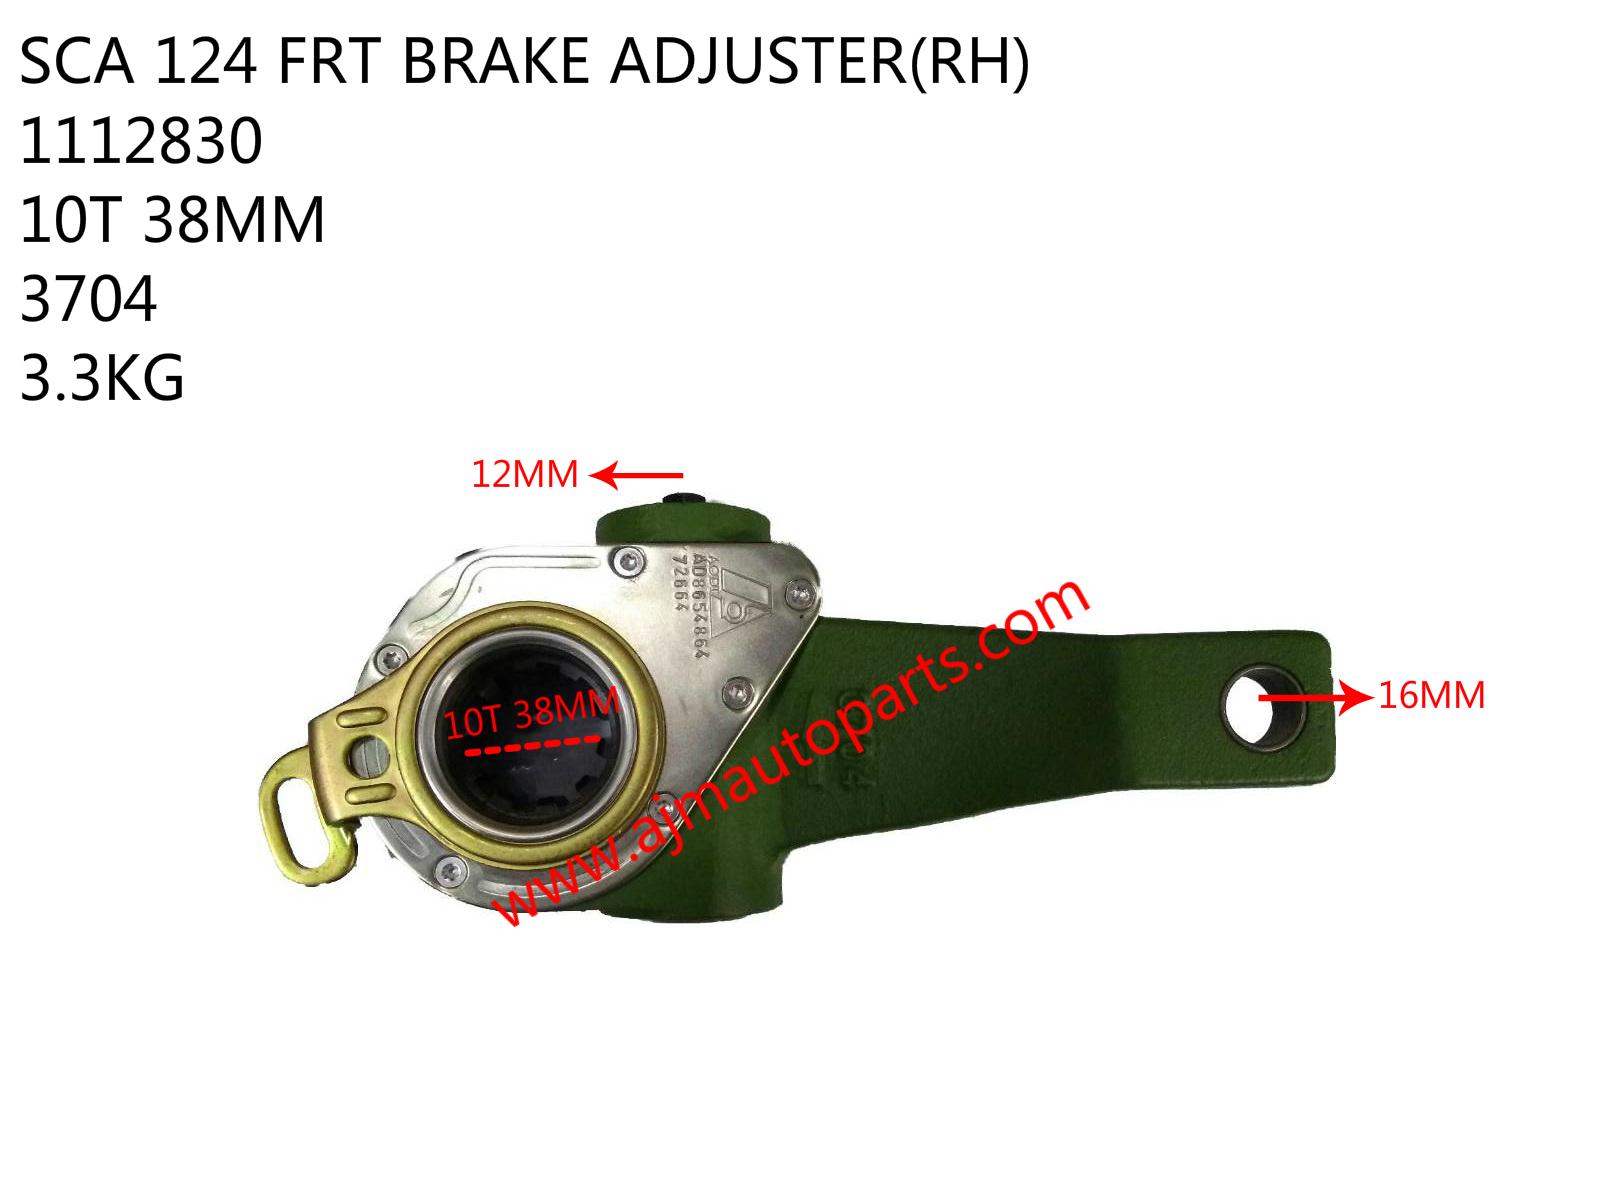 SCA 124 FRT BRAKE ADJUSTER(RH)-1112830